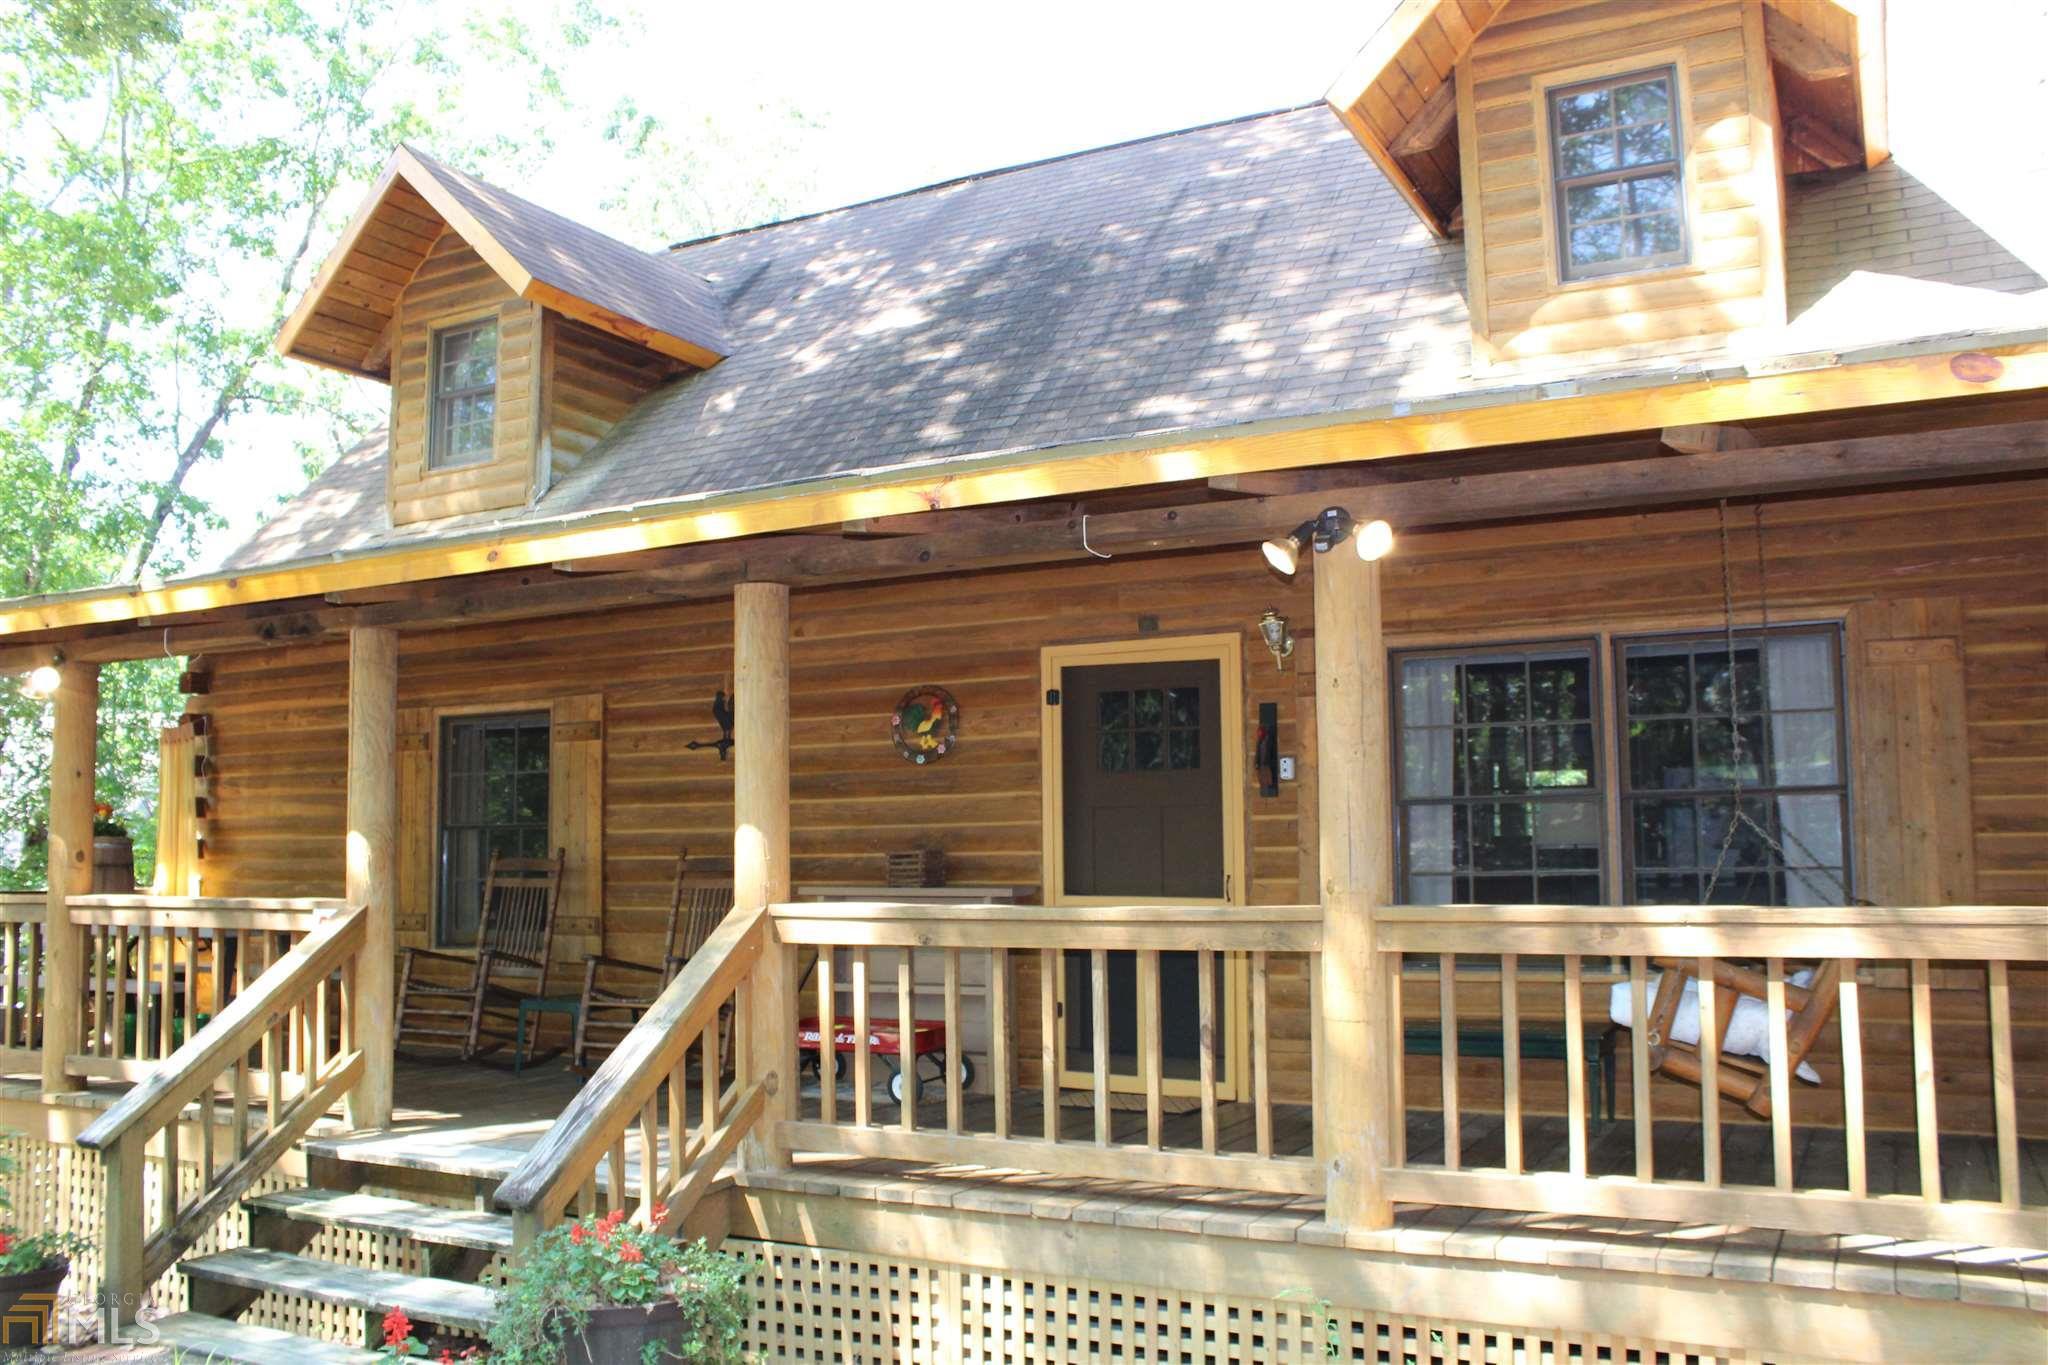 2167 Hines Gap Rd, Warm Springs, GA 31830 - Recently Sold | Trulia